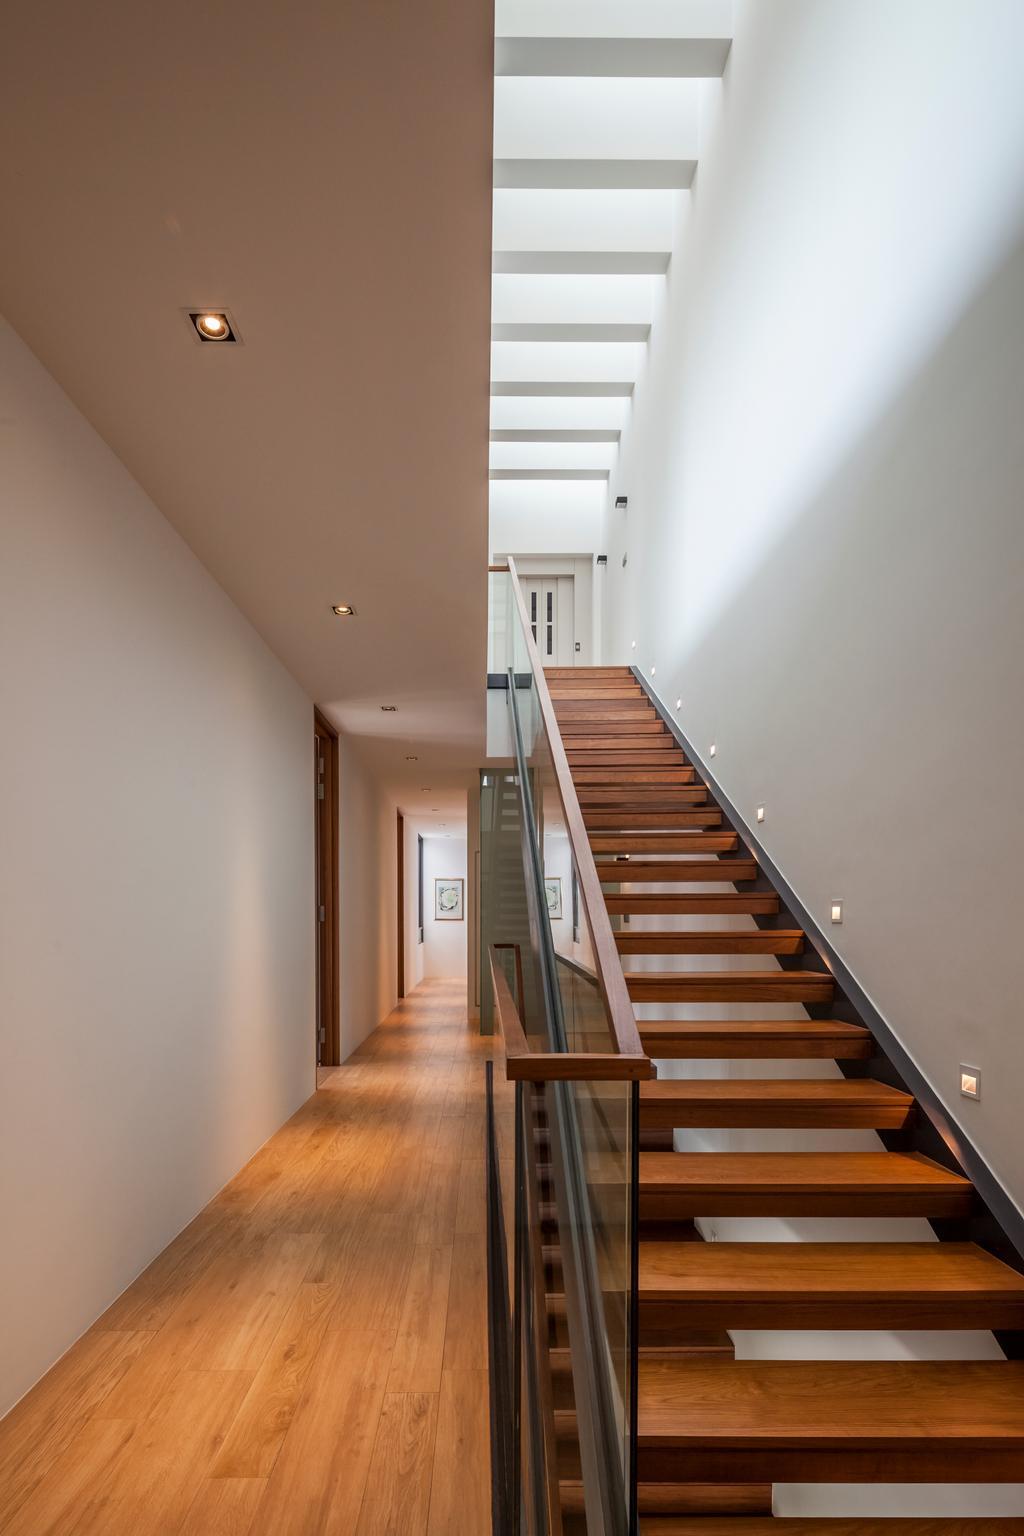 Modern, Landed, Serangoon (Sunny Side House), Architect, Wallflower Architecture + Design, Stairway Light, Wooden Flooring, Laminate Flooring, Glass Railing, Recessed Lights, Wooden Steps, Stairway, Steps, Banister, Handrail, Staircase, HDB, Building, Housing, Indoors, Loft